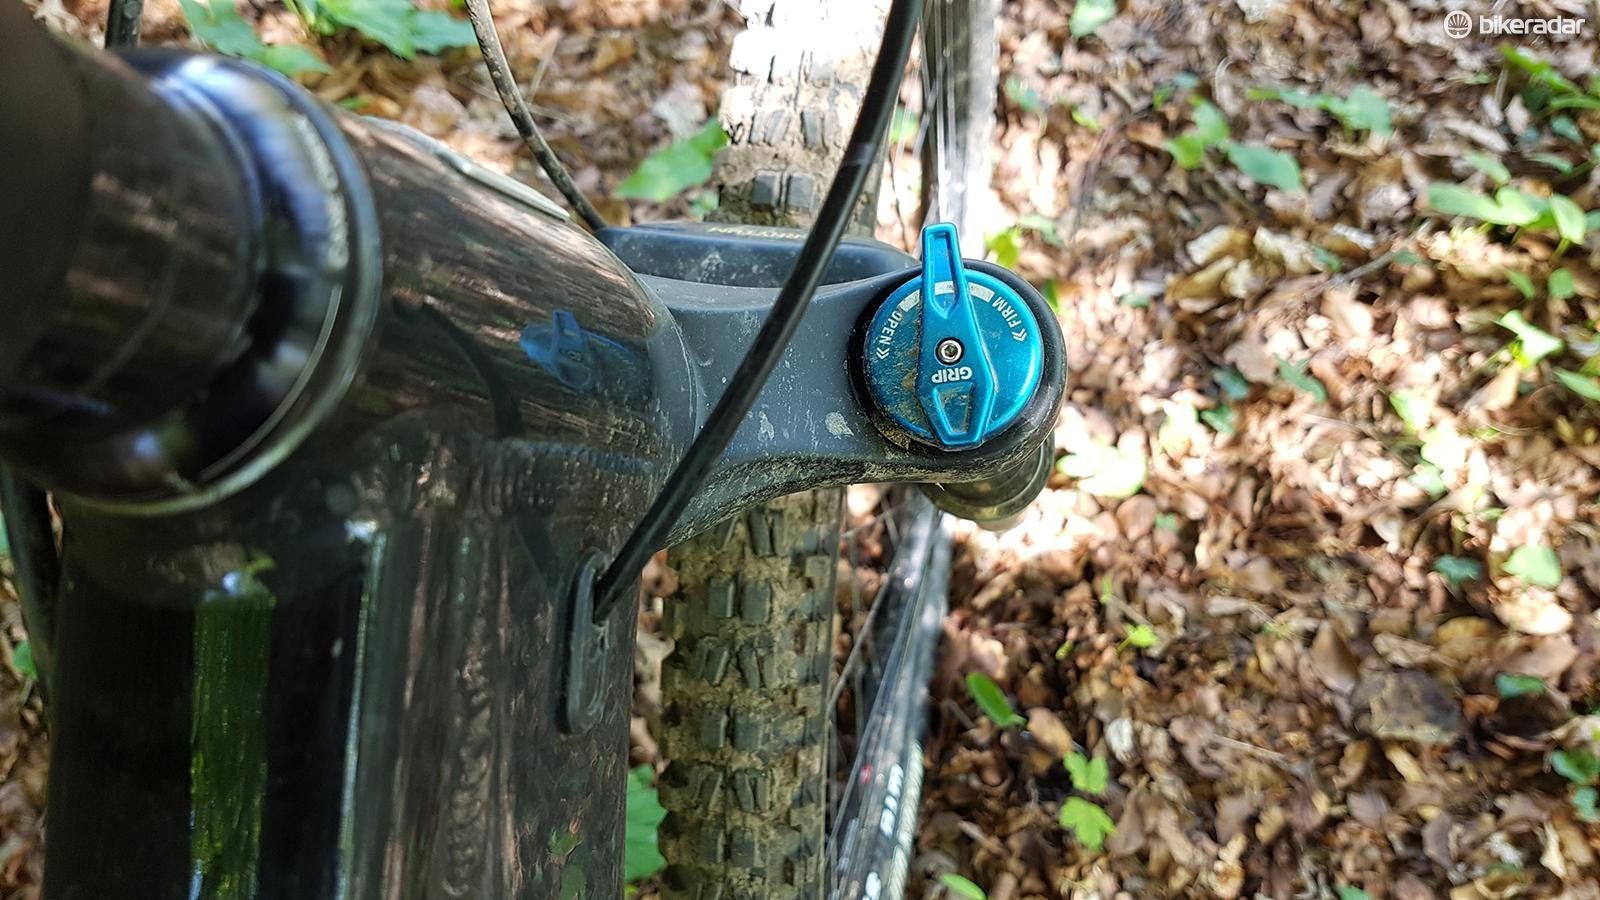 Santa Cruz Tallboy Alloy R review - BikeRadar